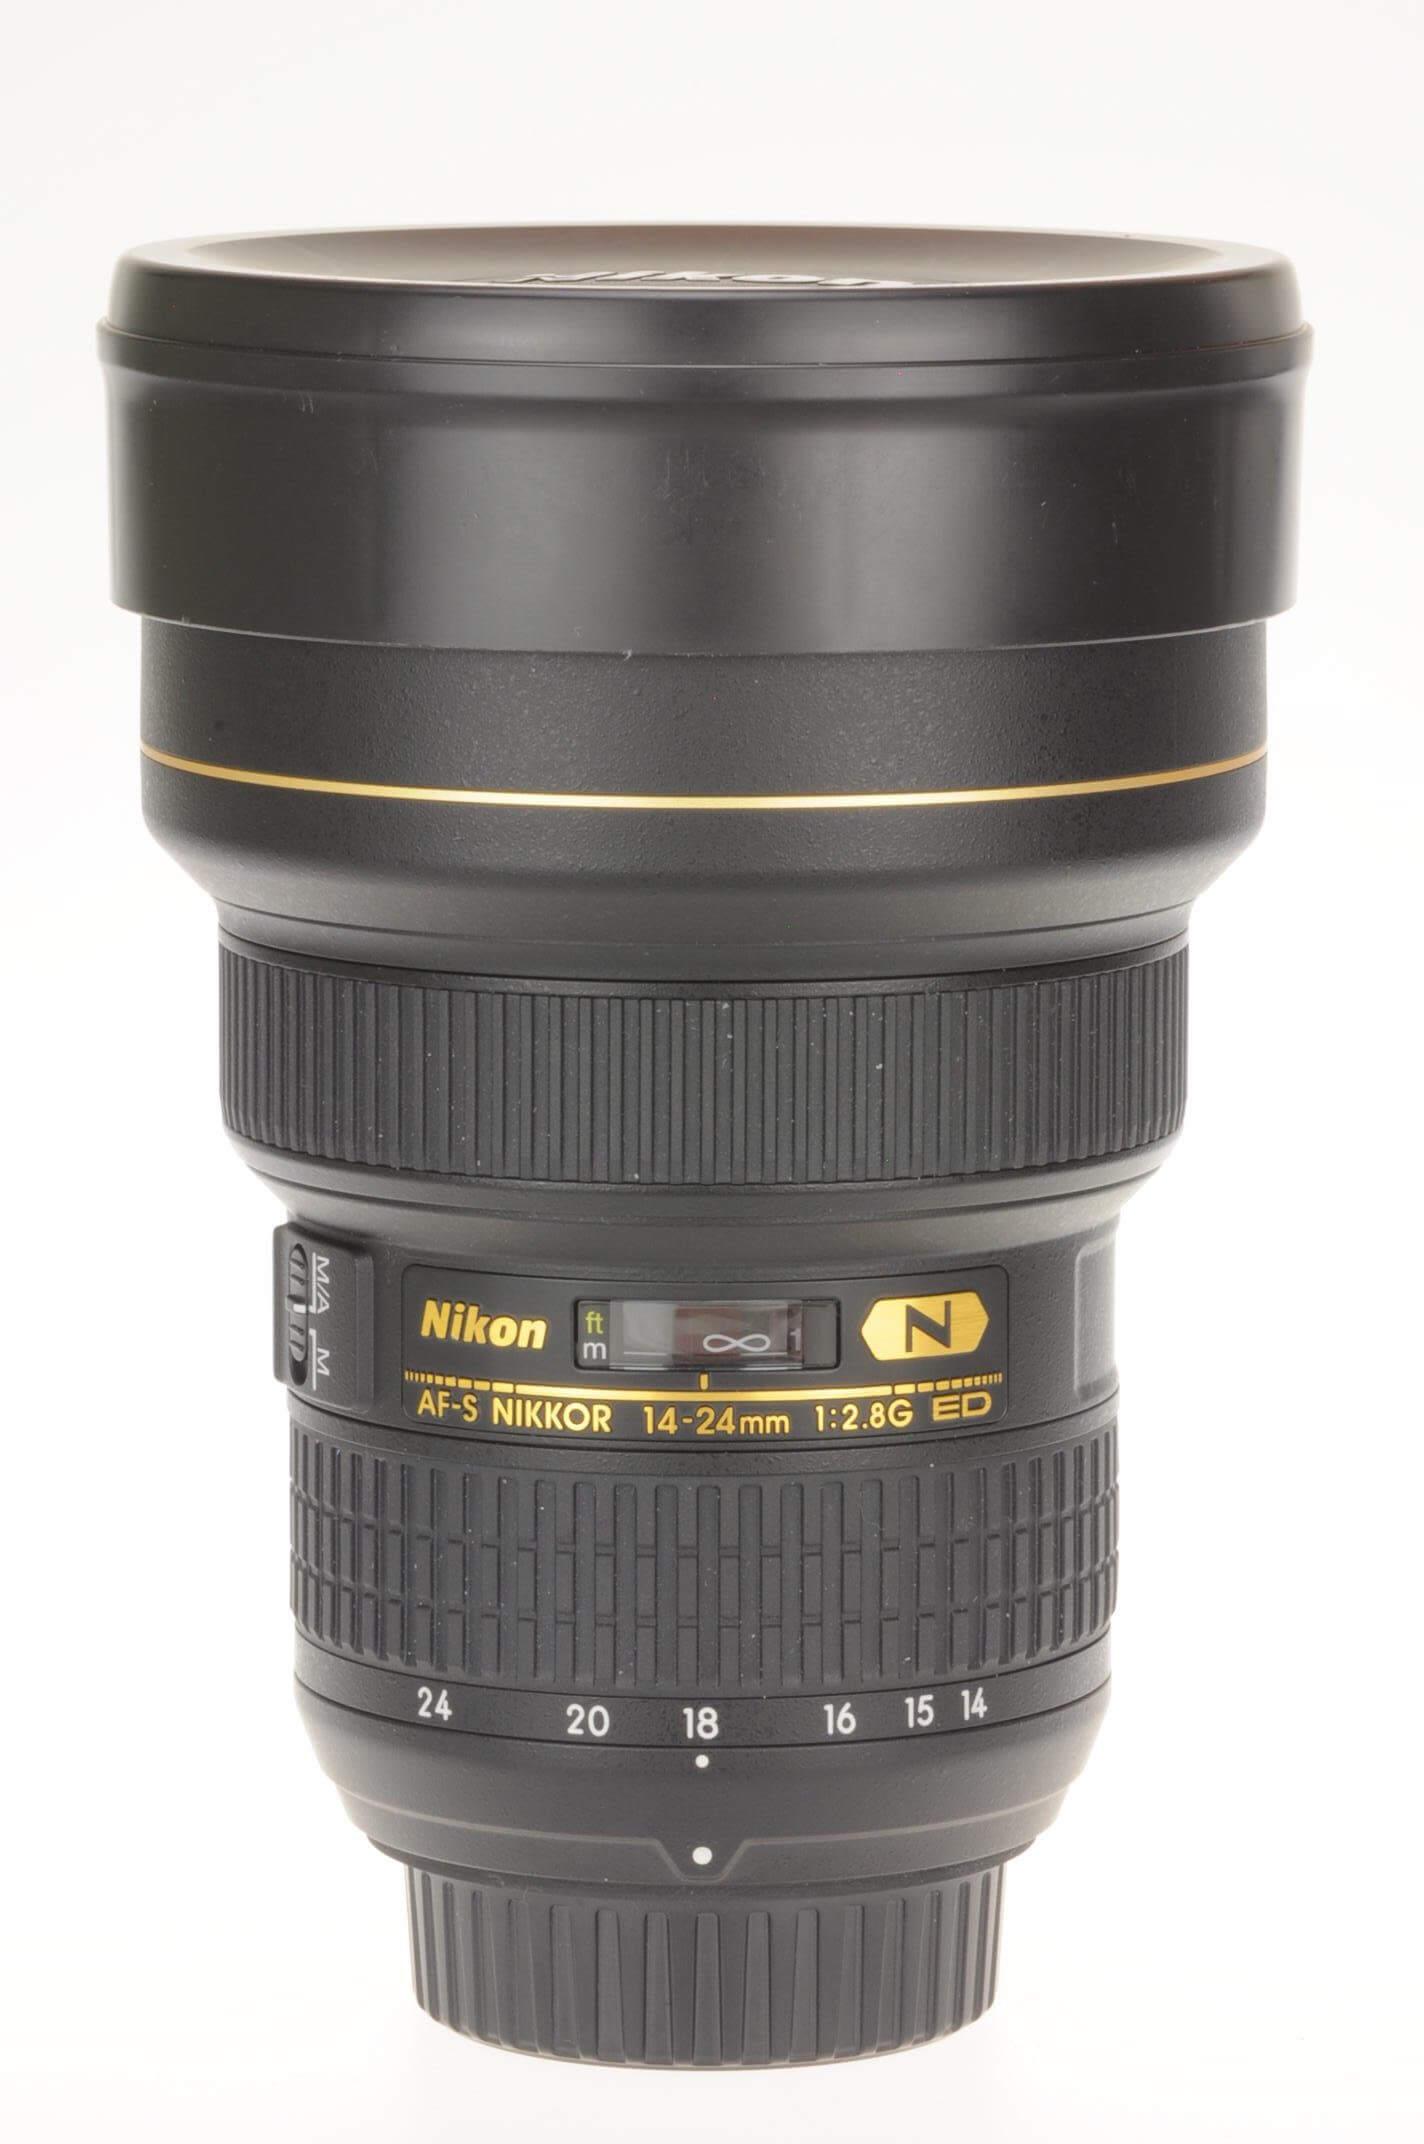 Nikon 14-24mm f2.8 AF-S G, stunning! Mint!